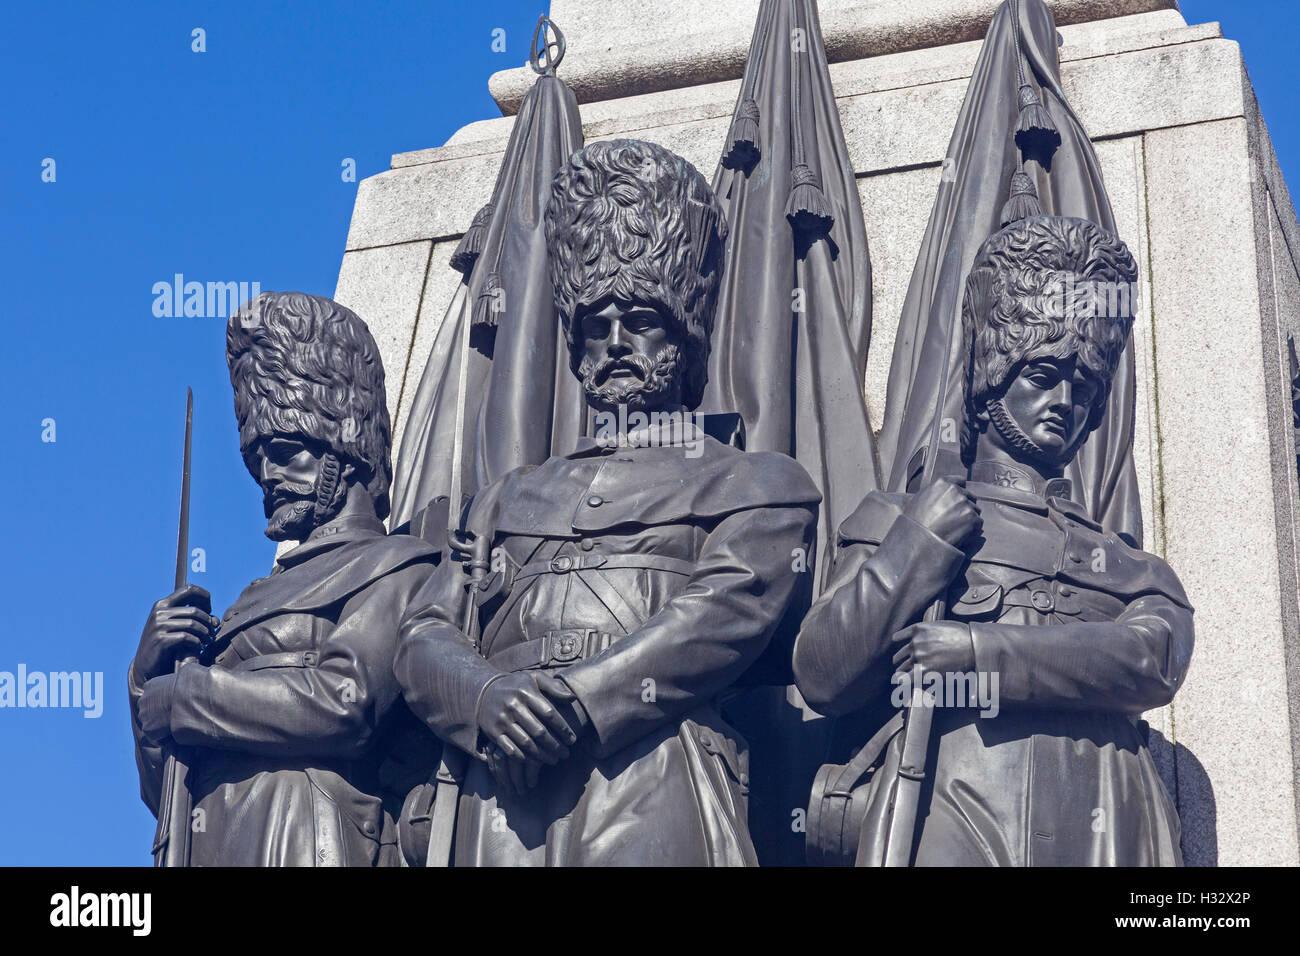 London, Waterloo Place   Grenadier guardsmen depicted on the Guards Crimea War Memorial - Stock Image